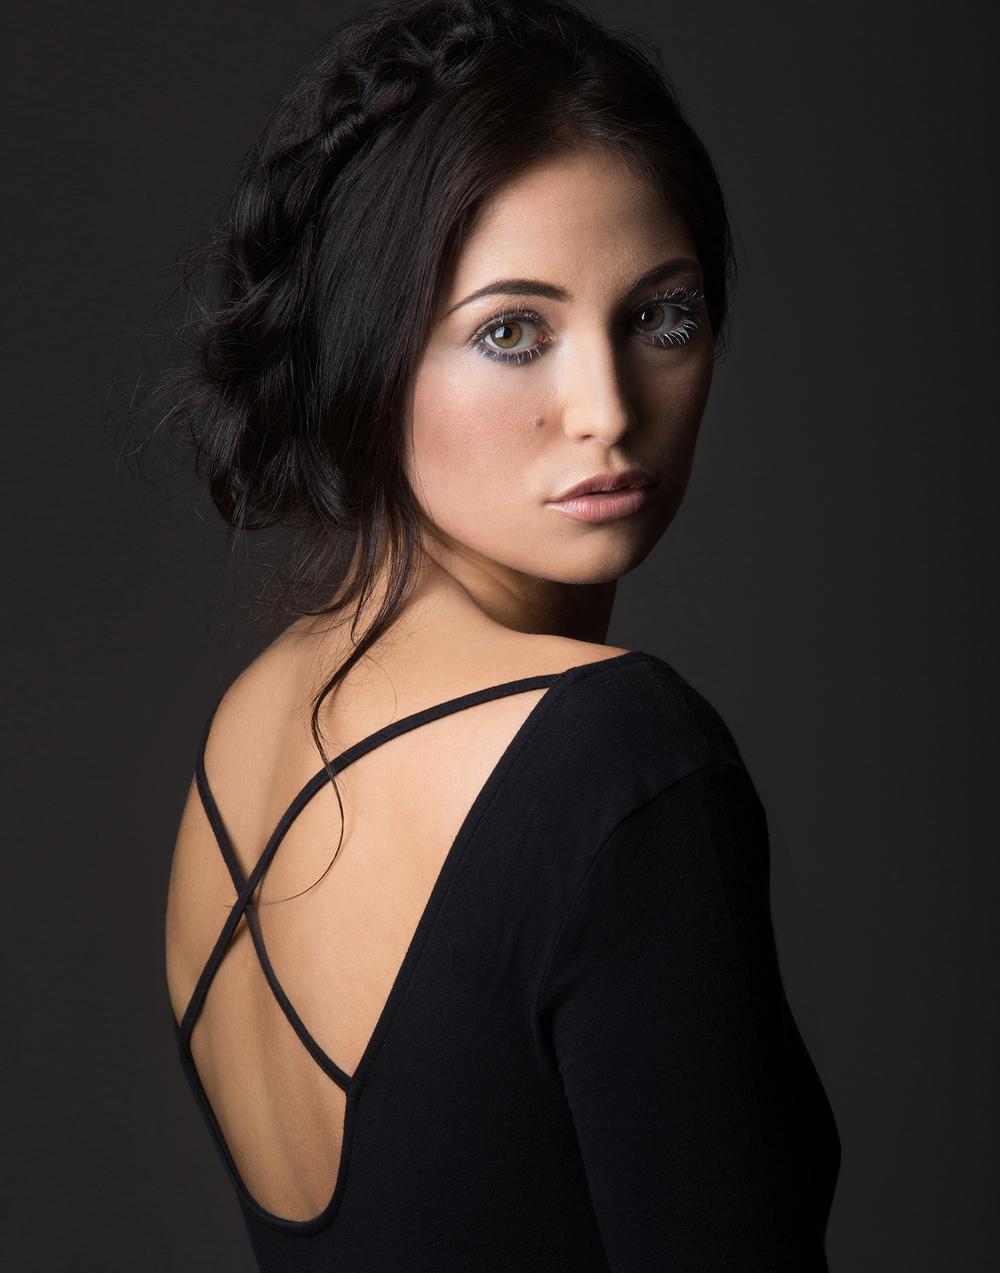 BeautyPhotography_BlackAndWhite_MichelleGirardPhotography07.jpg